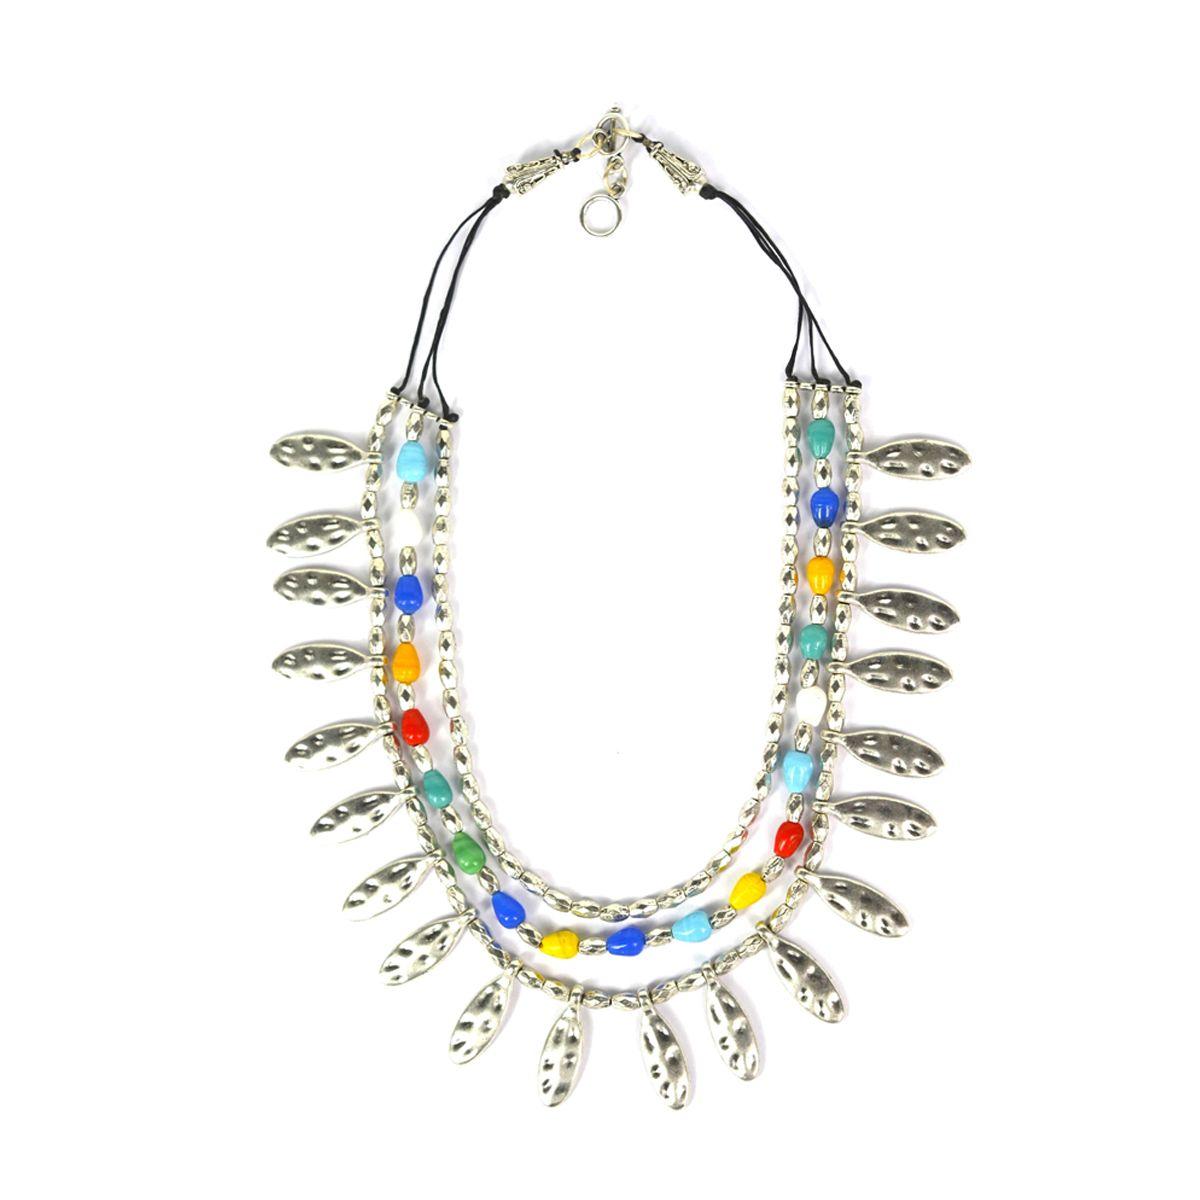 Stone Combi Multi String Necklace